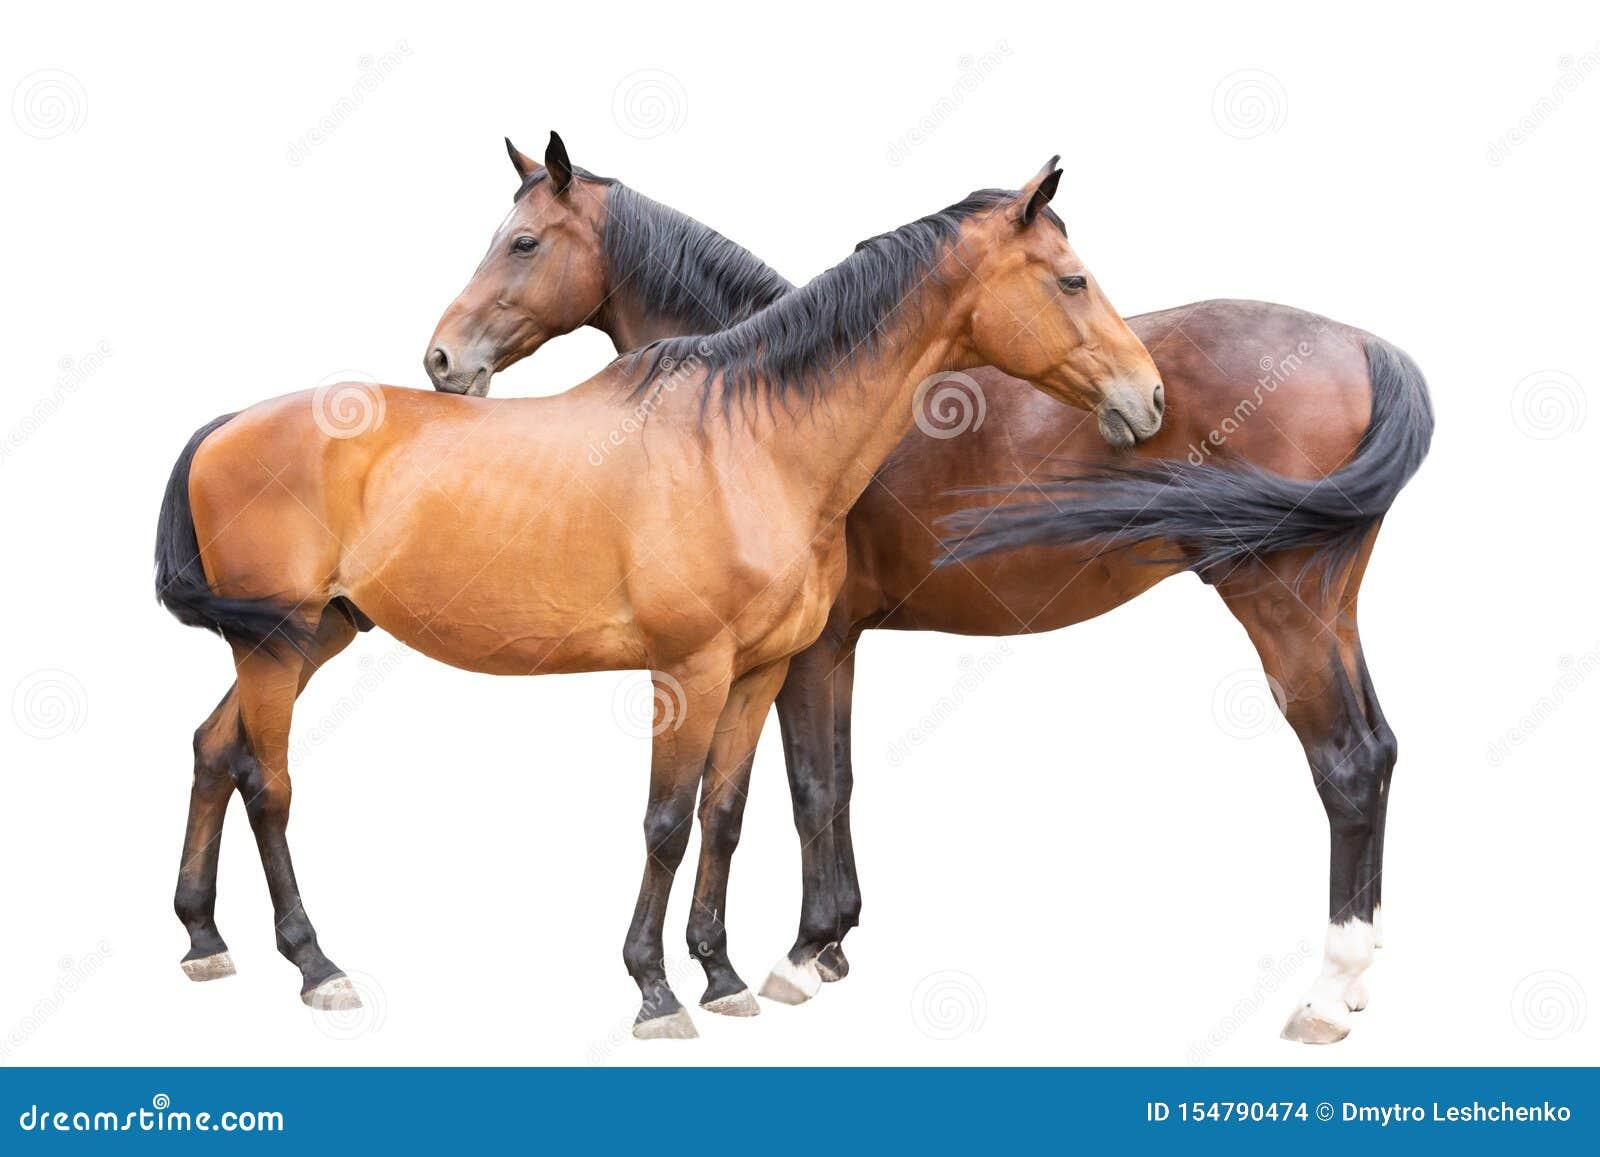 Beautiful Horses Racehorse English Racehorse Ukrainian Riding Horse Stock Photo Image Of Racing Strong 154790474